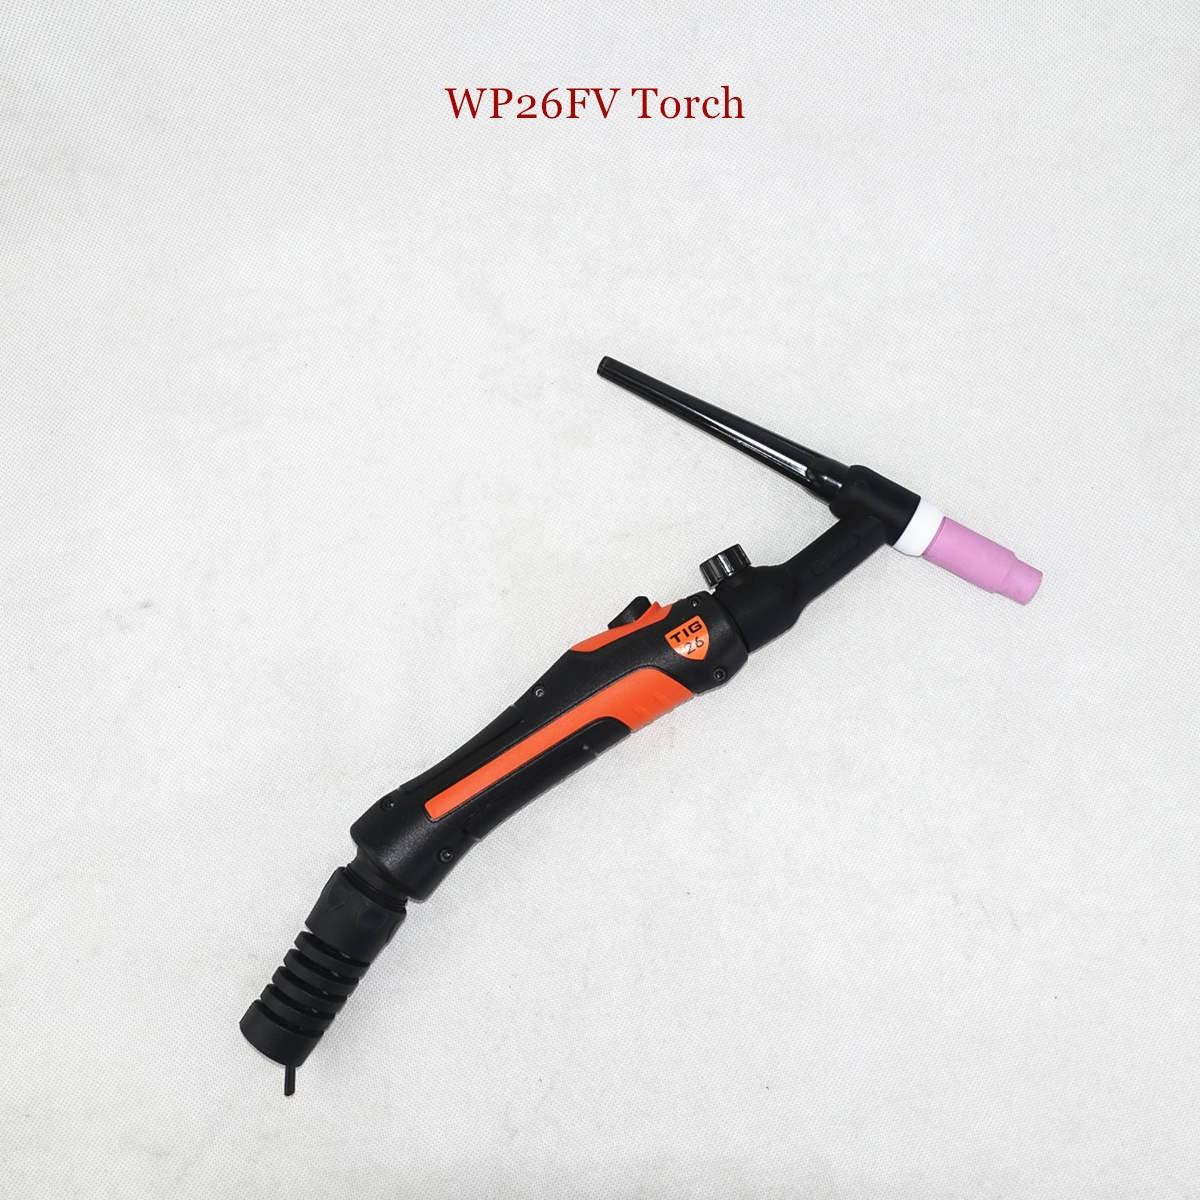 Profesional Wp26 Tig Torch Gtaw Gas Tungsten Arc Welding Gun Wp26fv Argon Air Cooled Gas Valve Remote Control Tig Welding Torch Obor Las Aliexpress